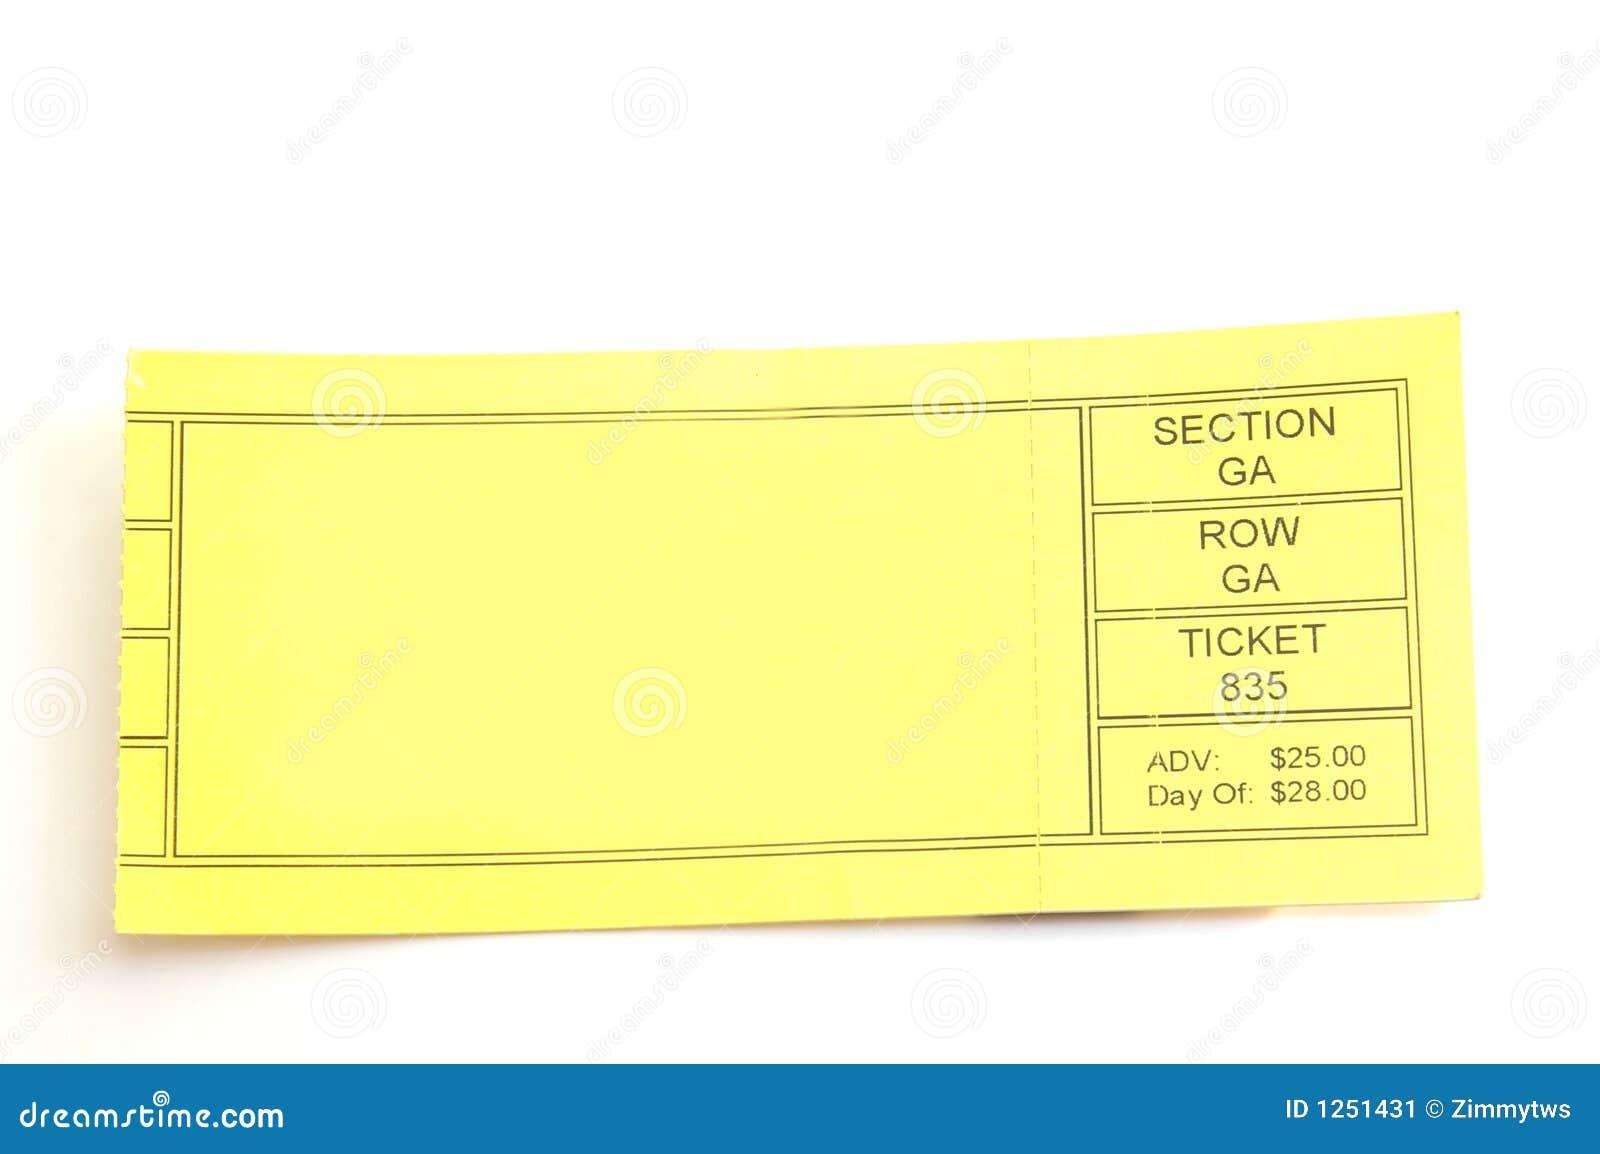 blank ticket stub ticket stub with blank space